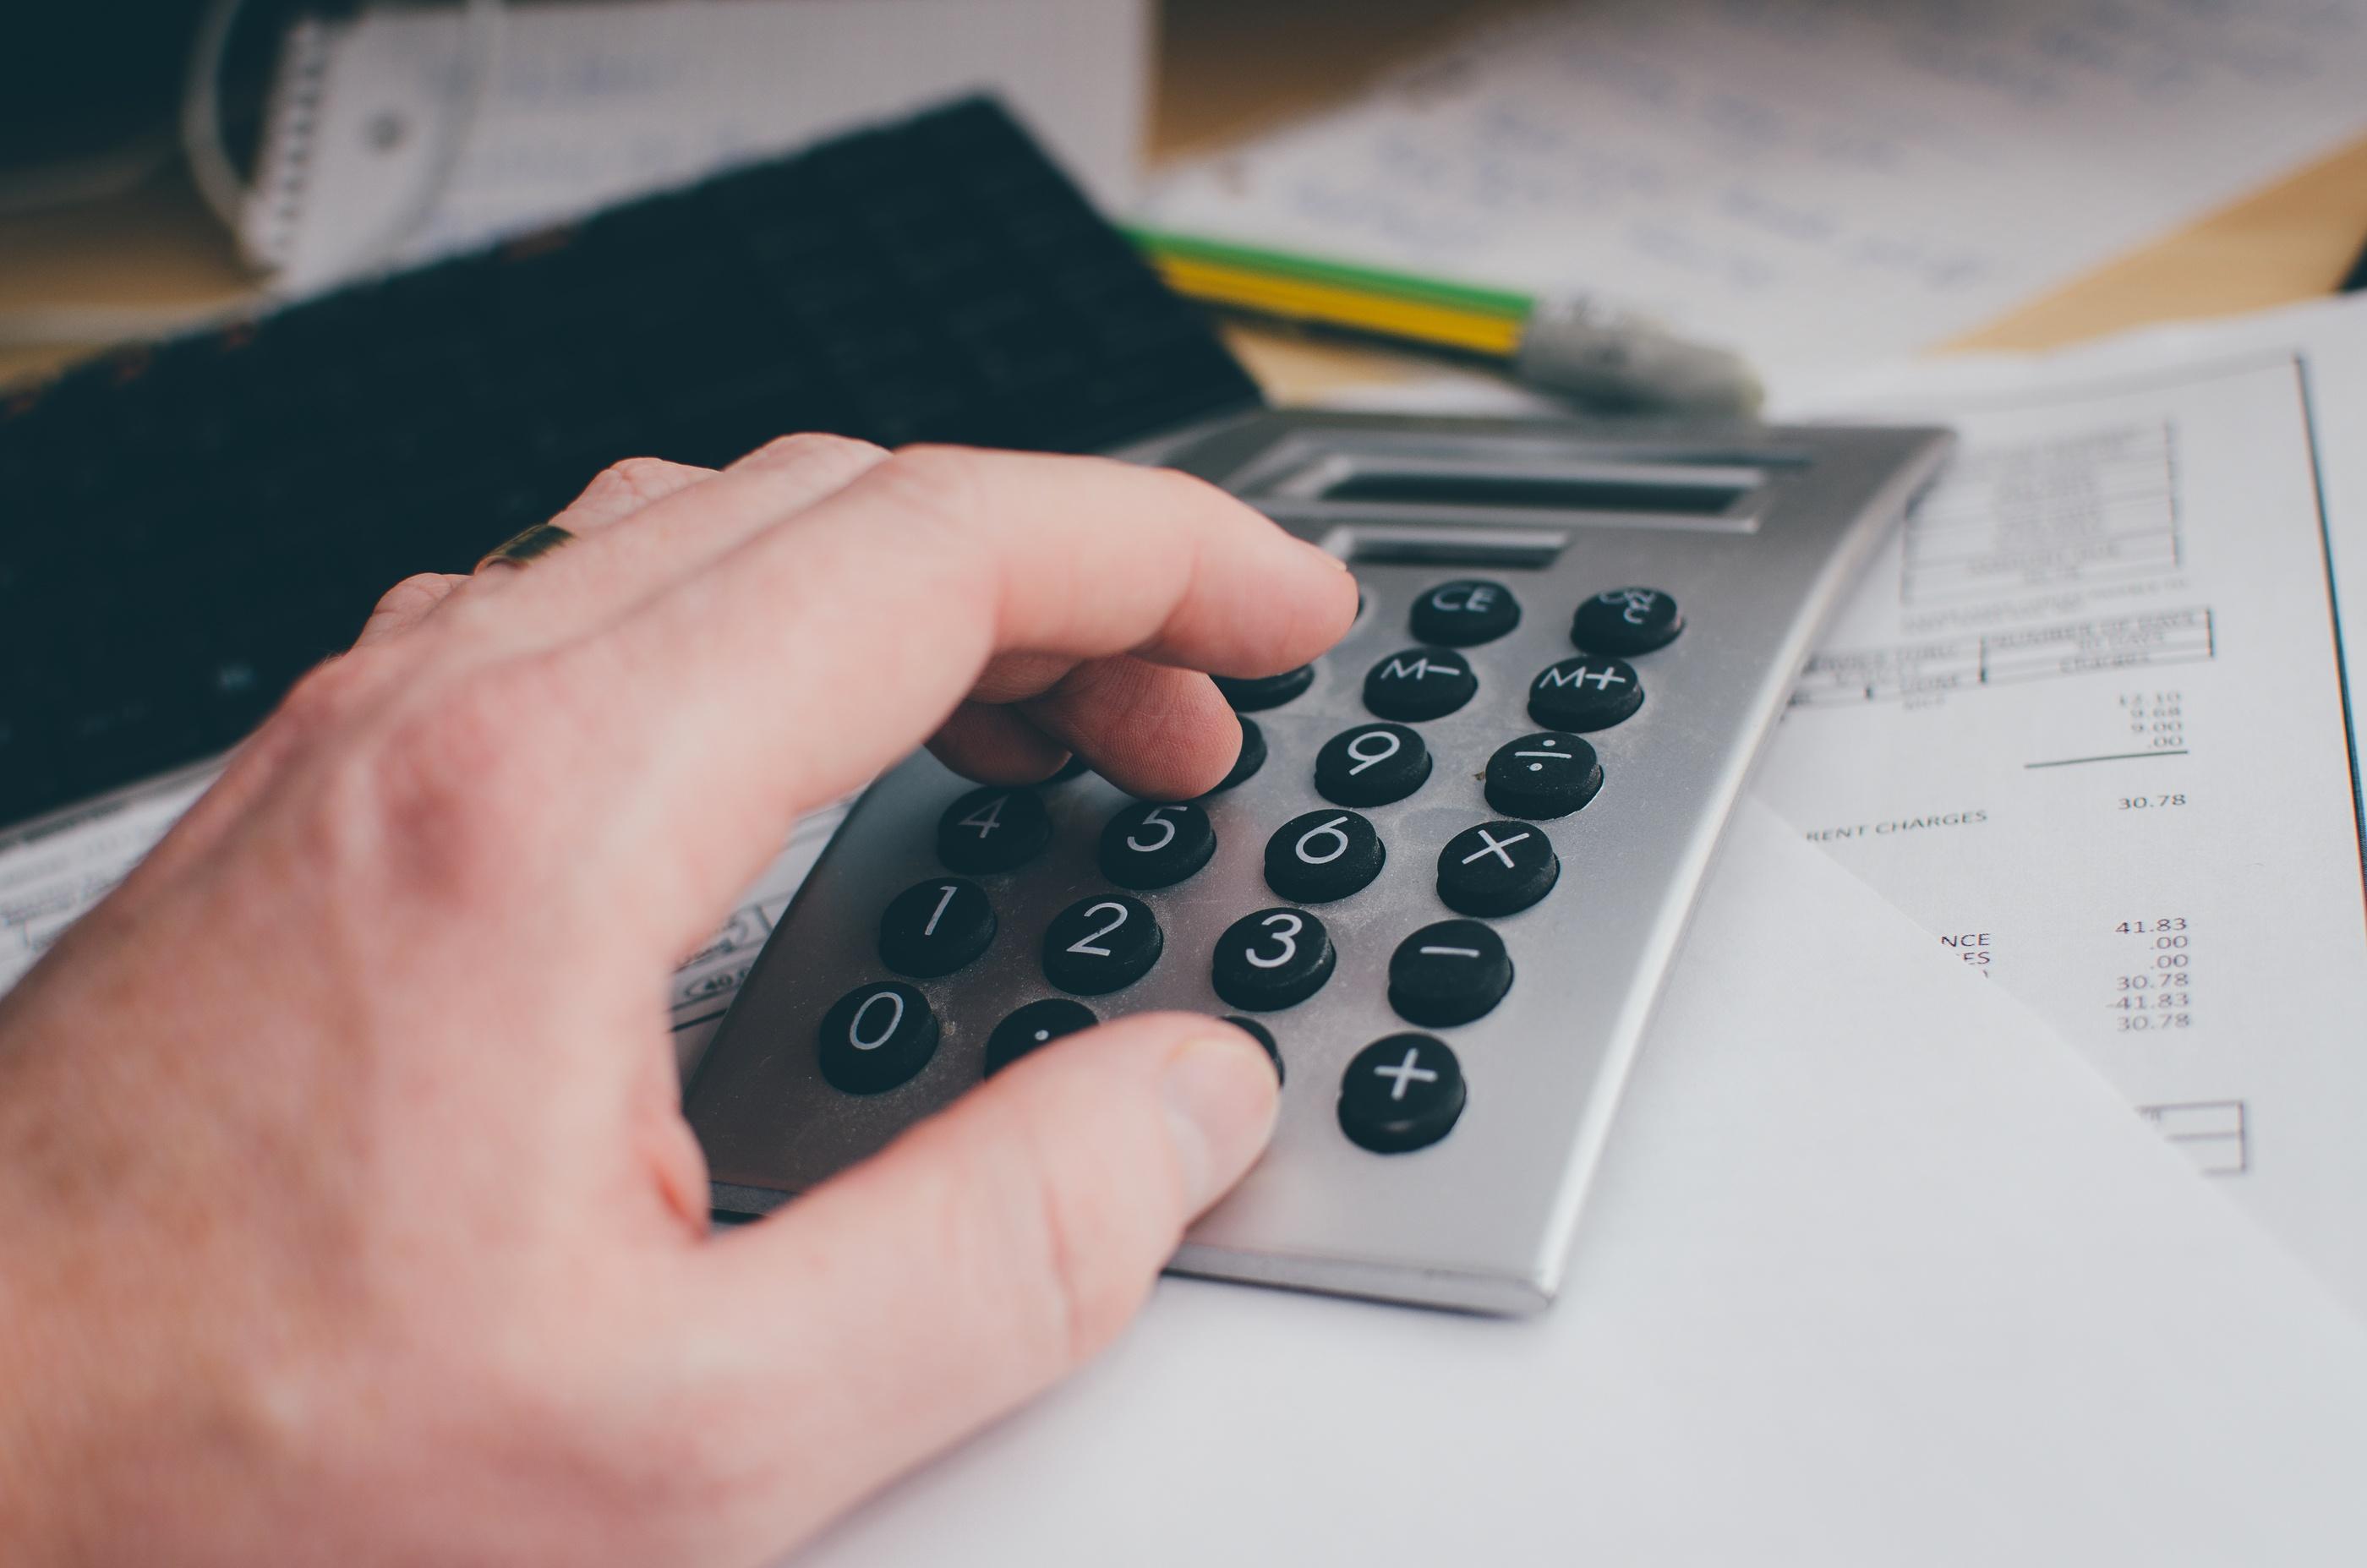 Tool to calculate saving money